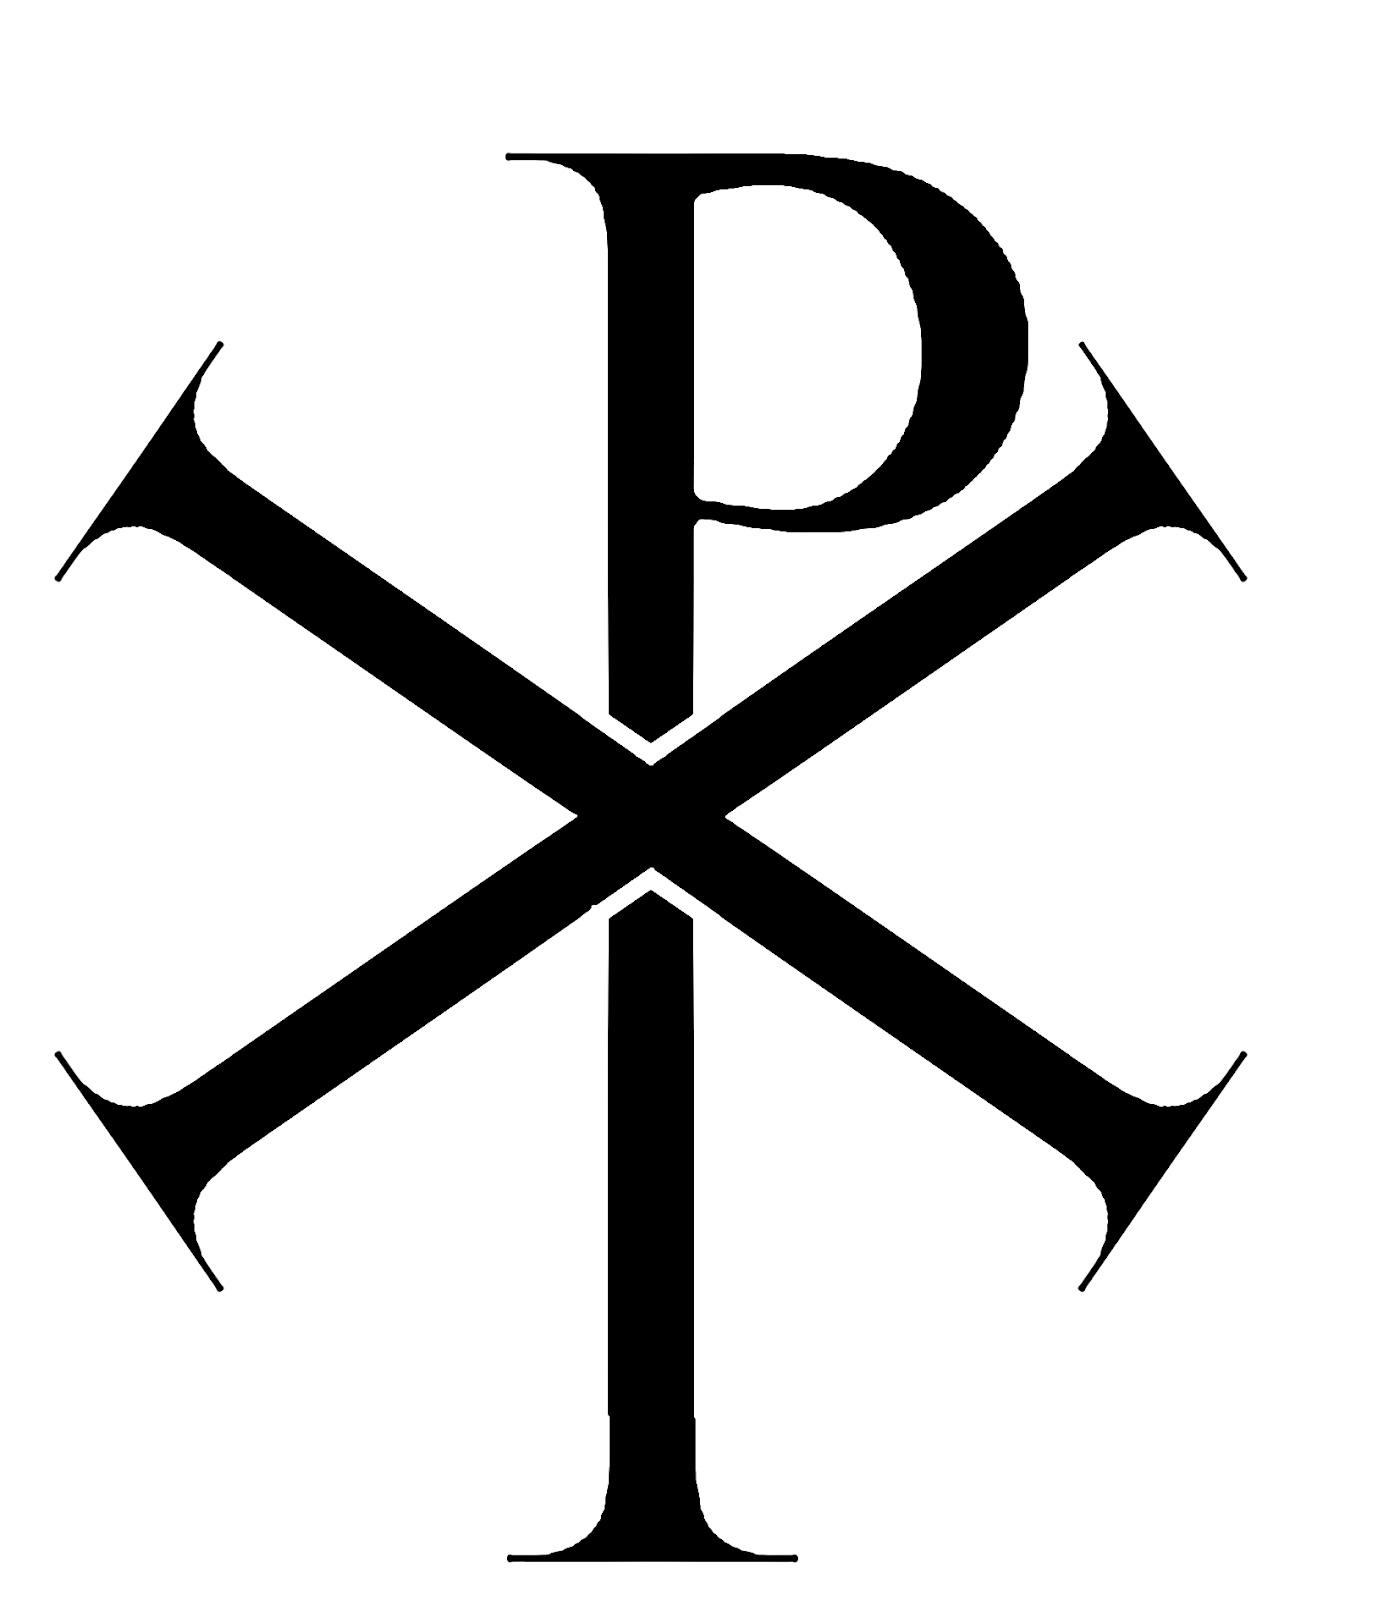 Catholic Church Symbols Clipart Panda Free Clipart Images